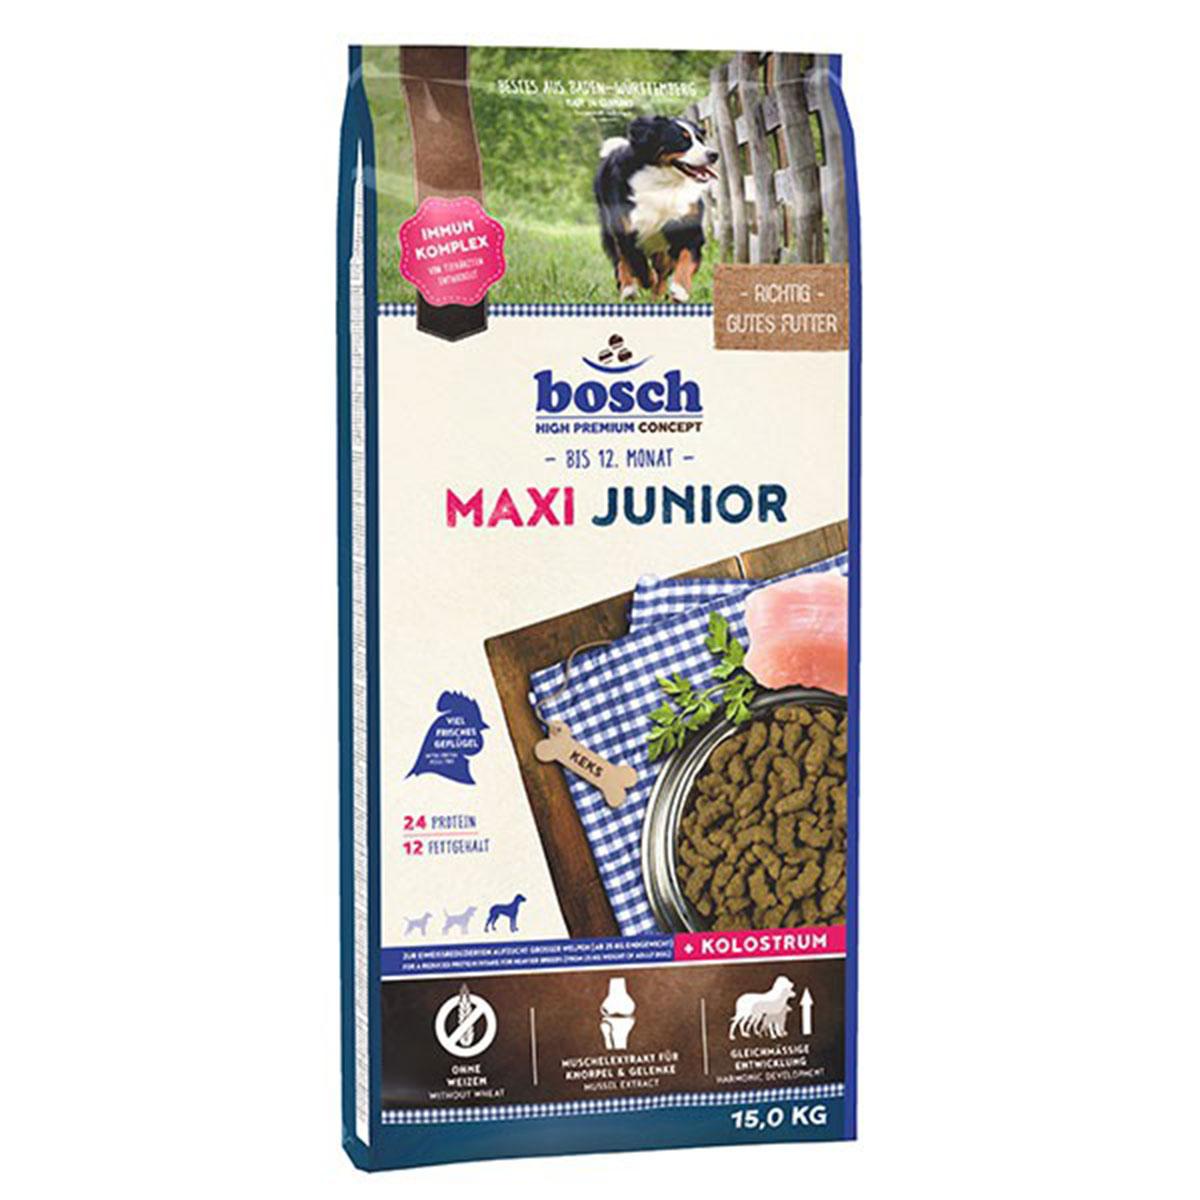 Bosch Hundefutter Maxi Junior 15kg